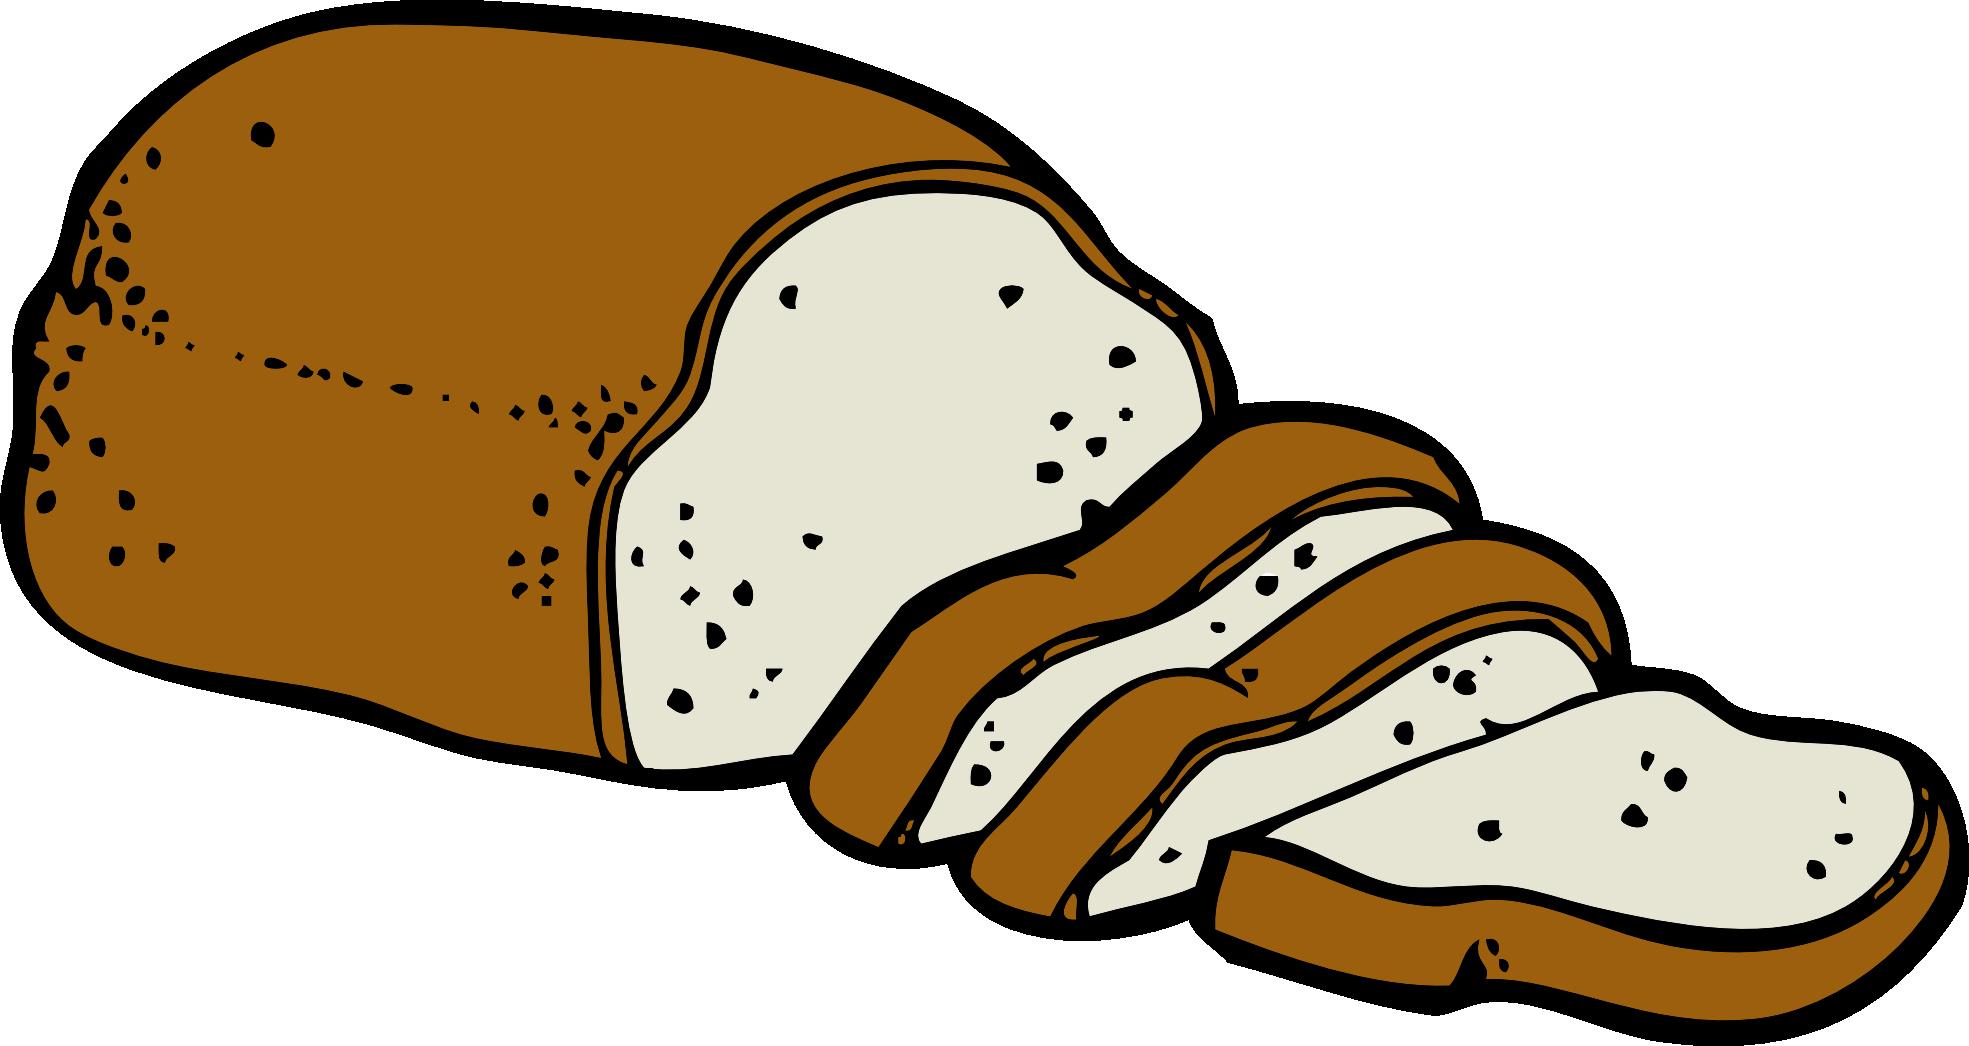 Bread Roll clipart bread baker Images Bread 5 com clipart